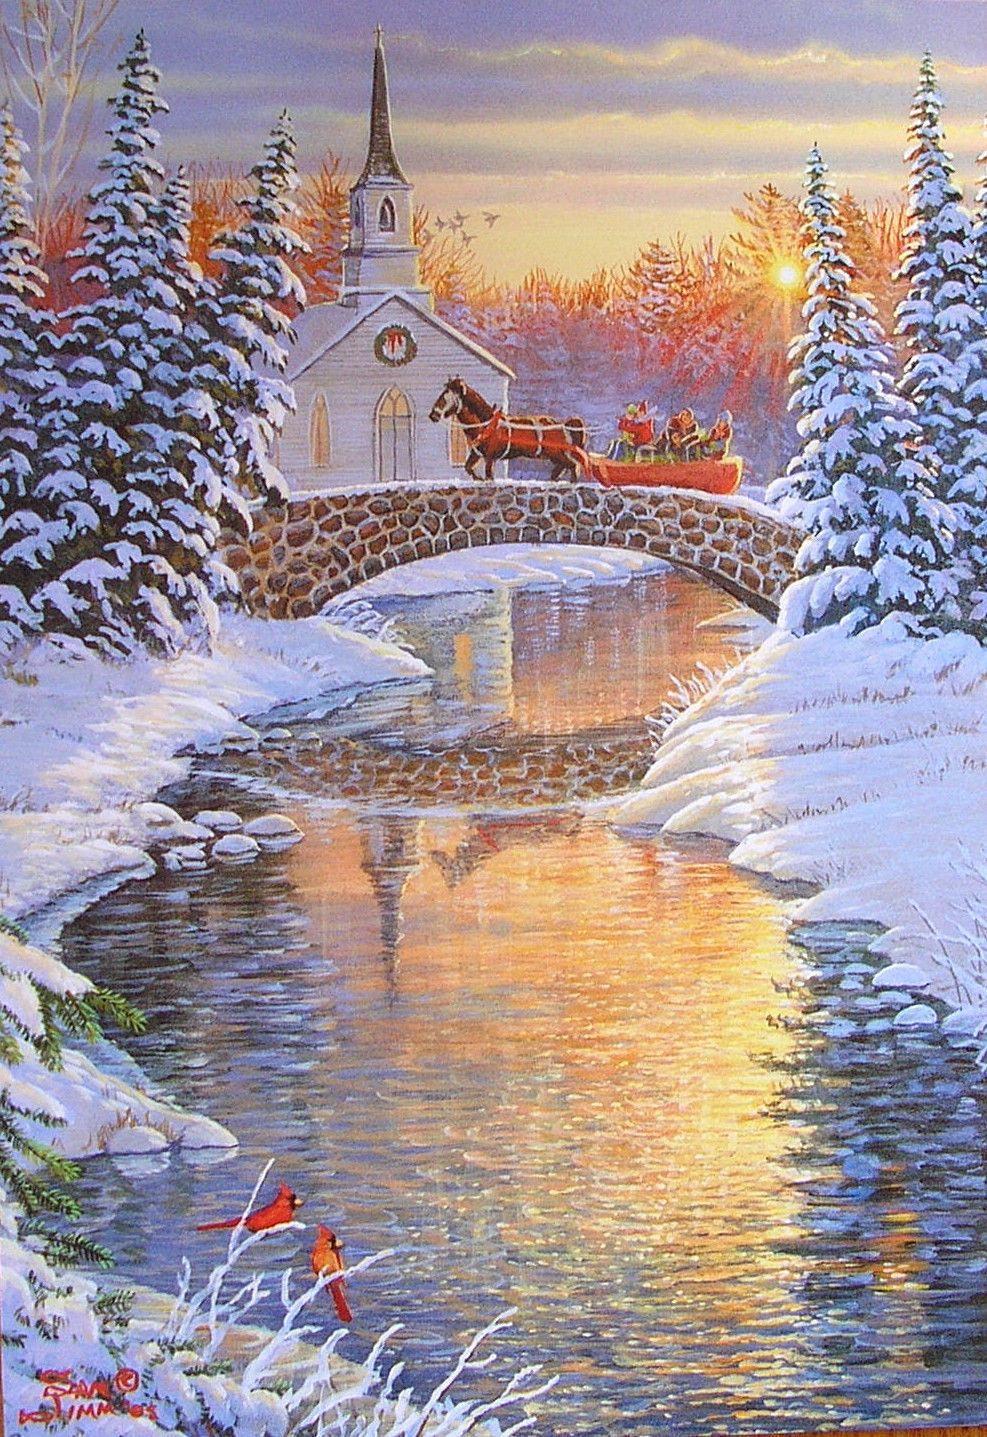 Leanin Tree Sam Timm Church Horse Sleigh Bridge Sunrise Christmas